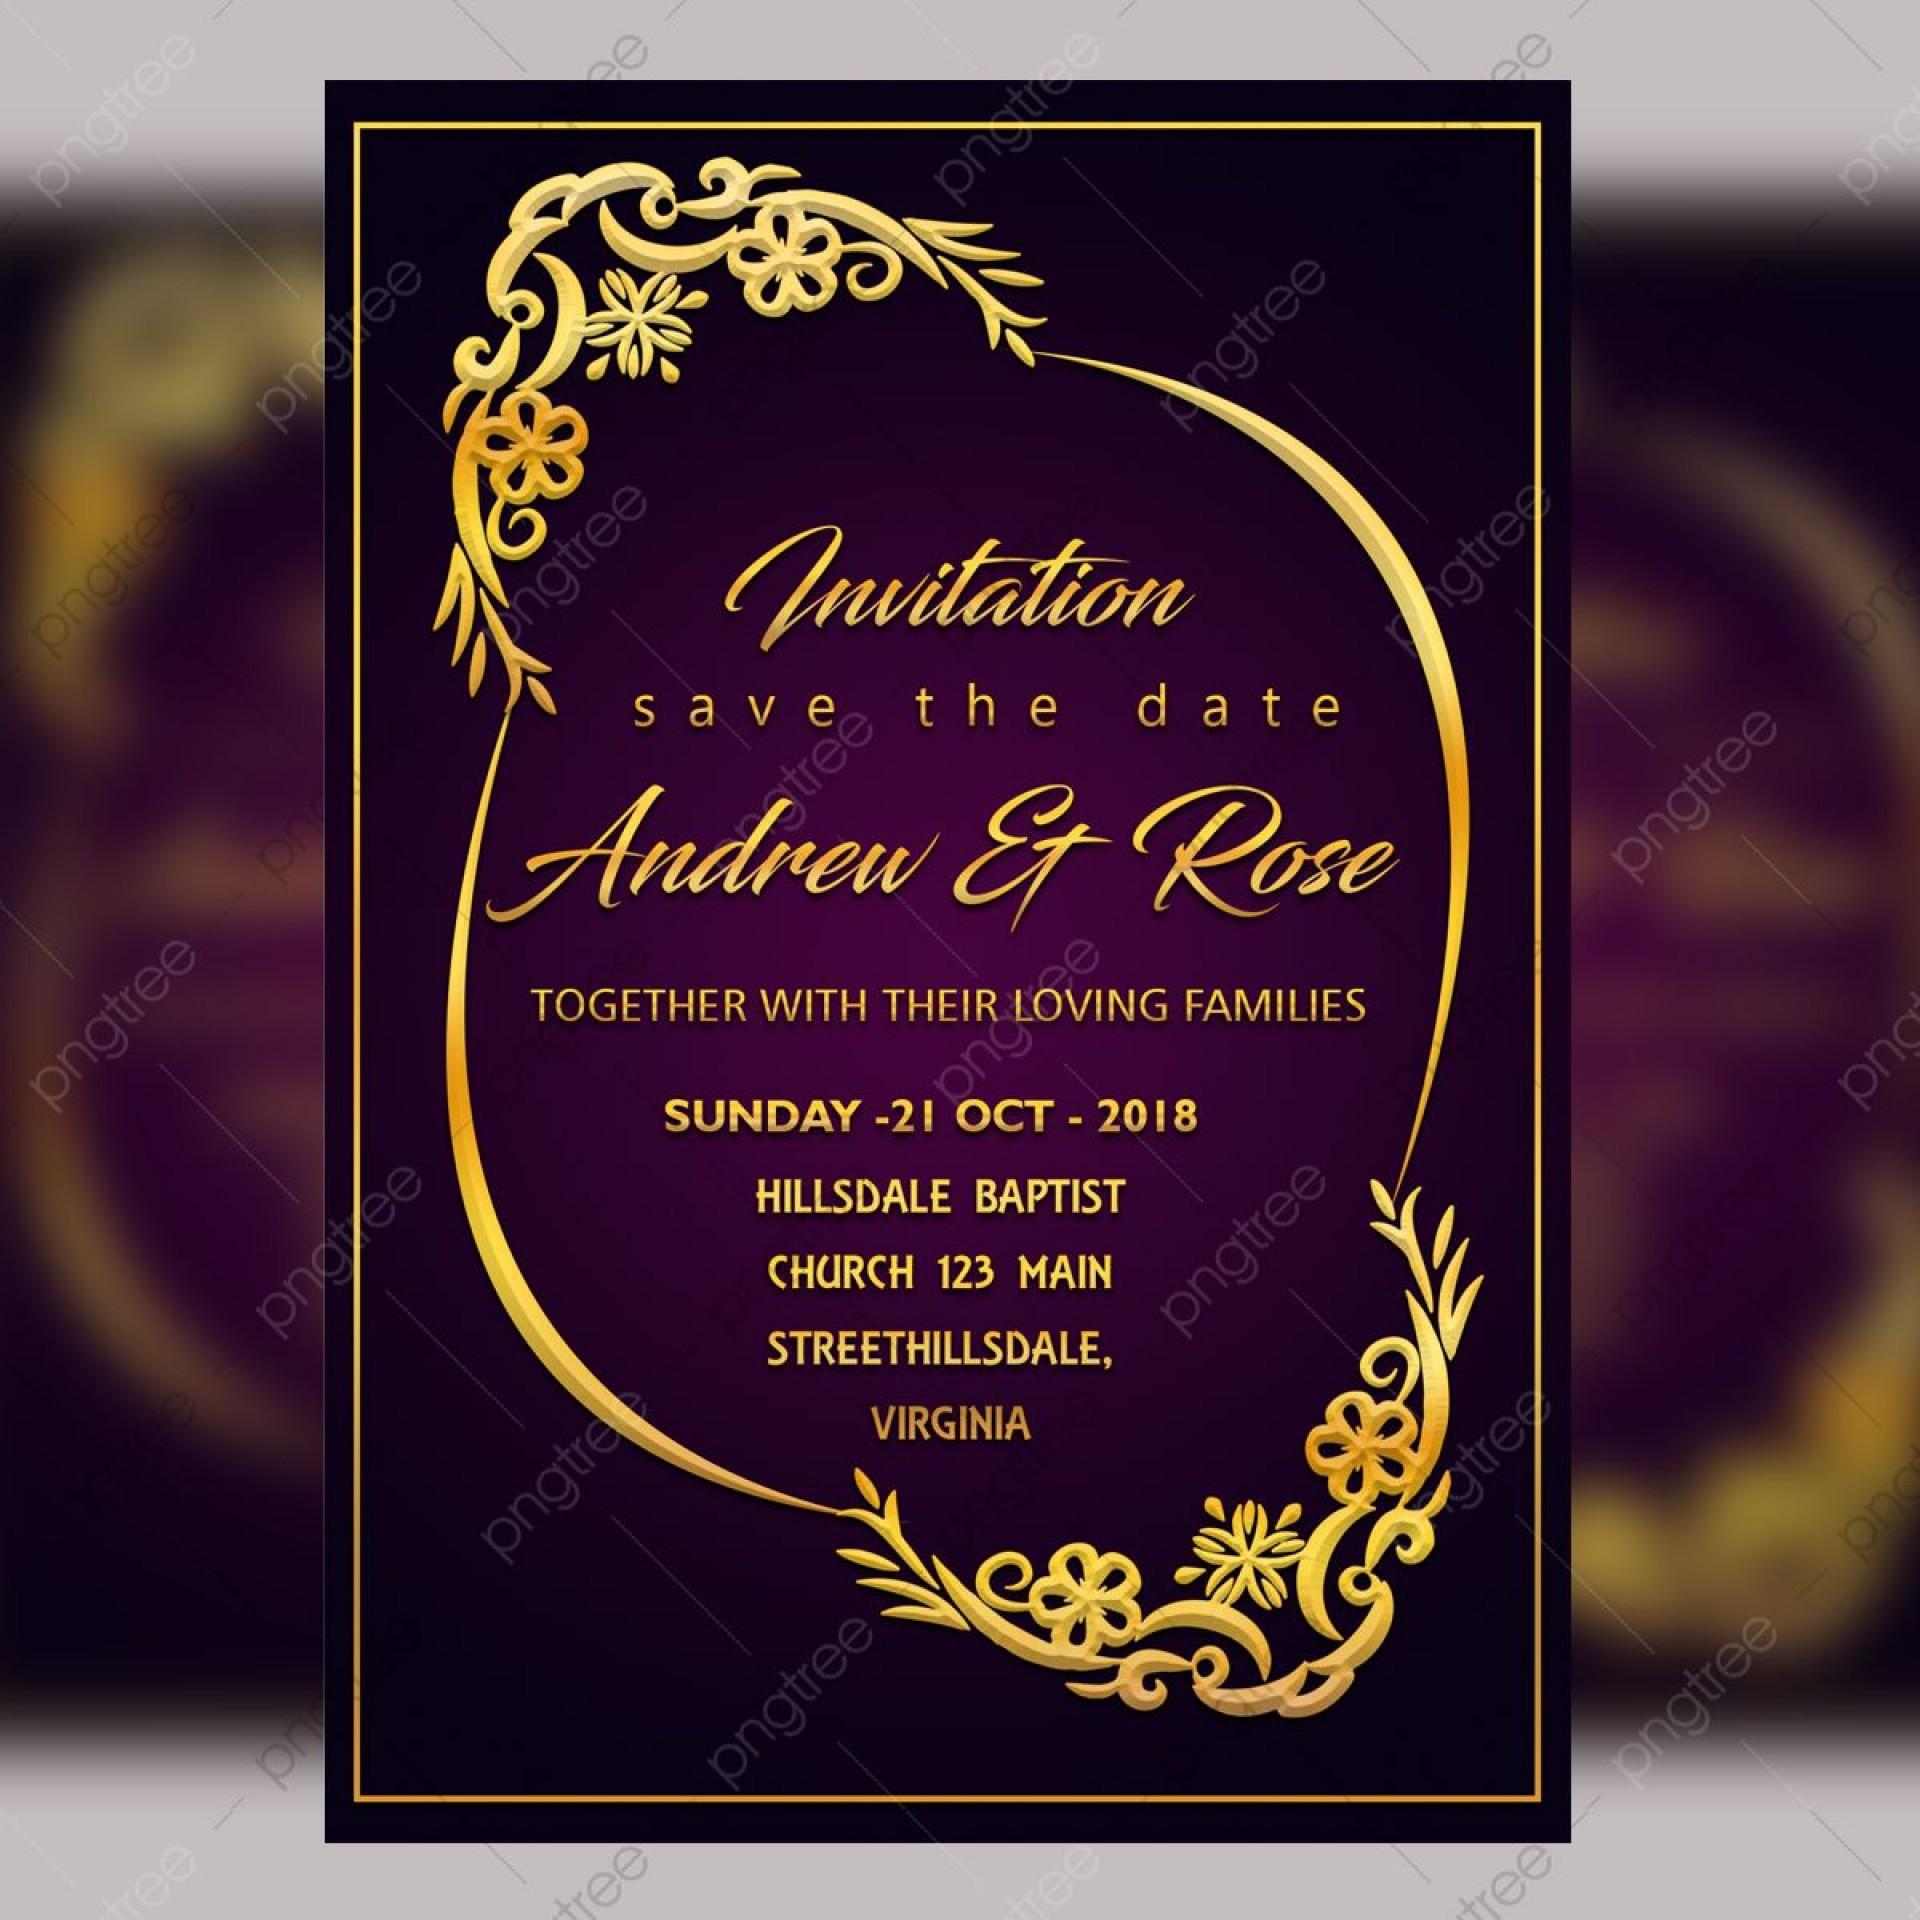 006 Imposing Sample Wedding Invitation Card Template Idea  Templates Free Design Response Wording1920